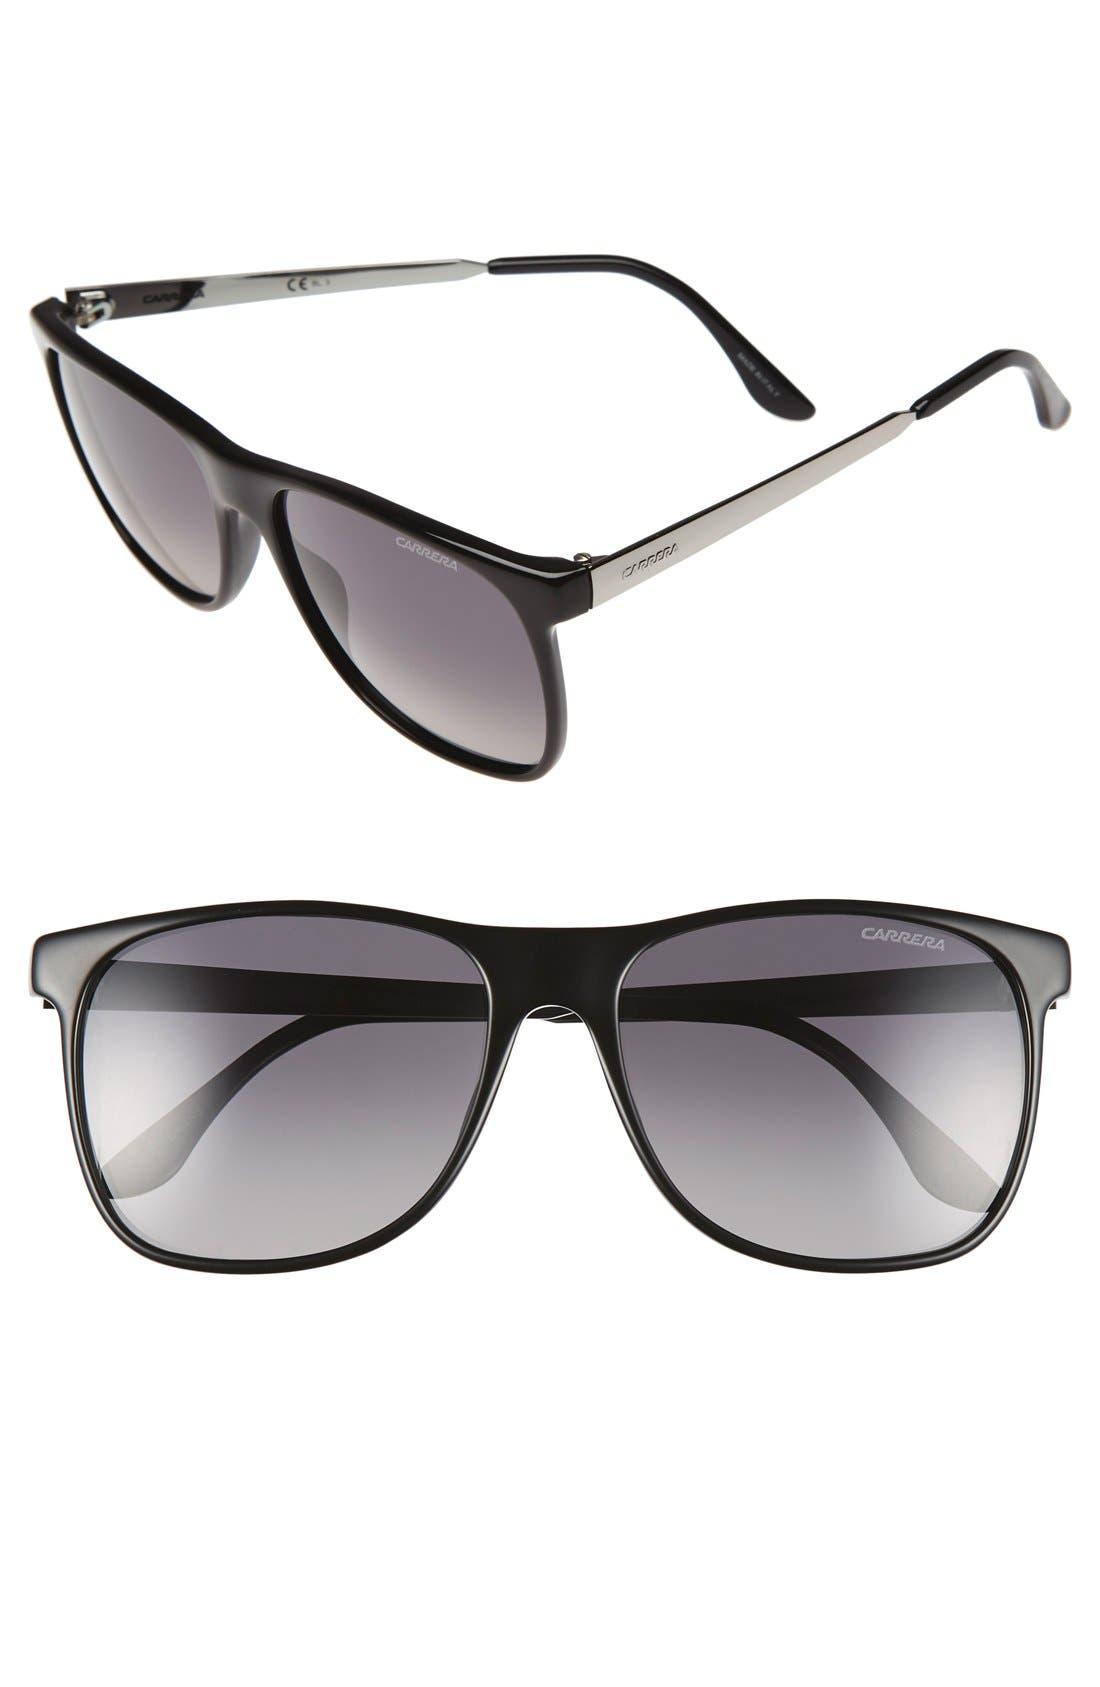 57mm Polarized Sunglasses,                         Main,                         color, Black/ Grey /Gunmetal